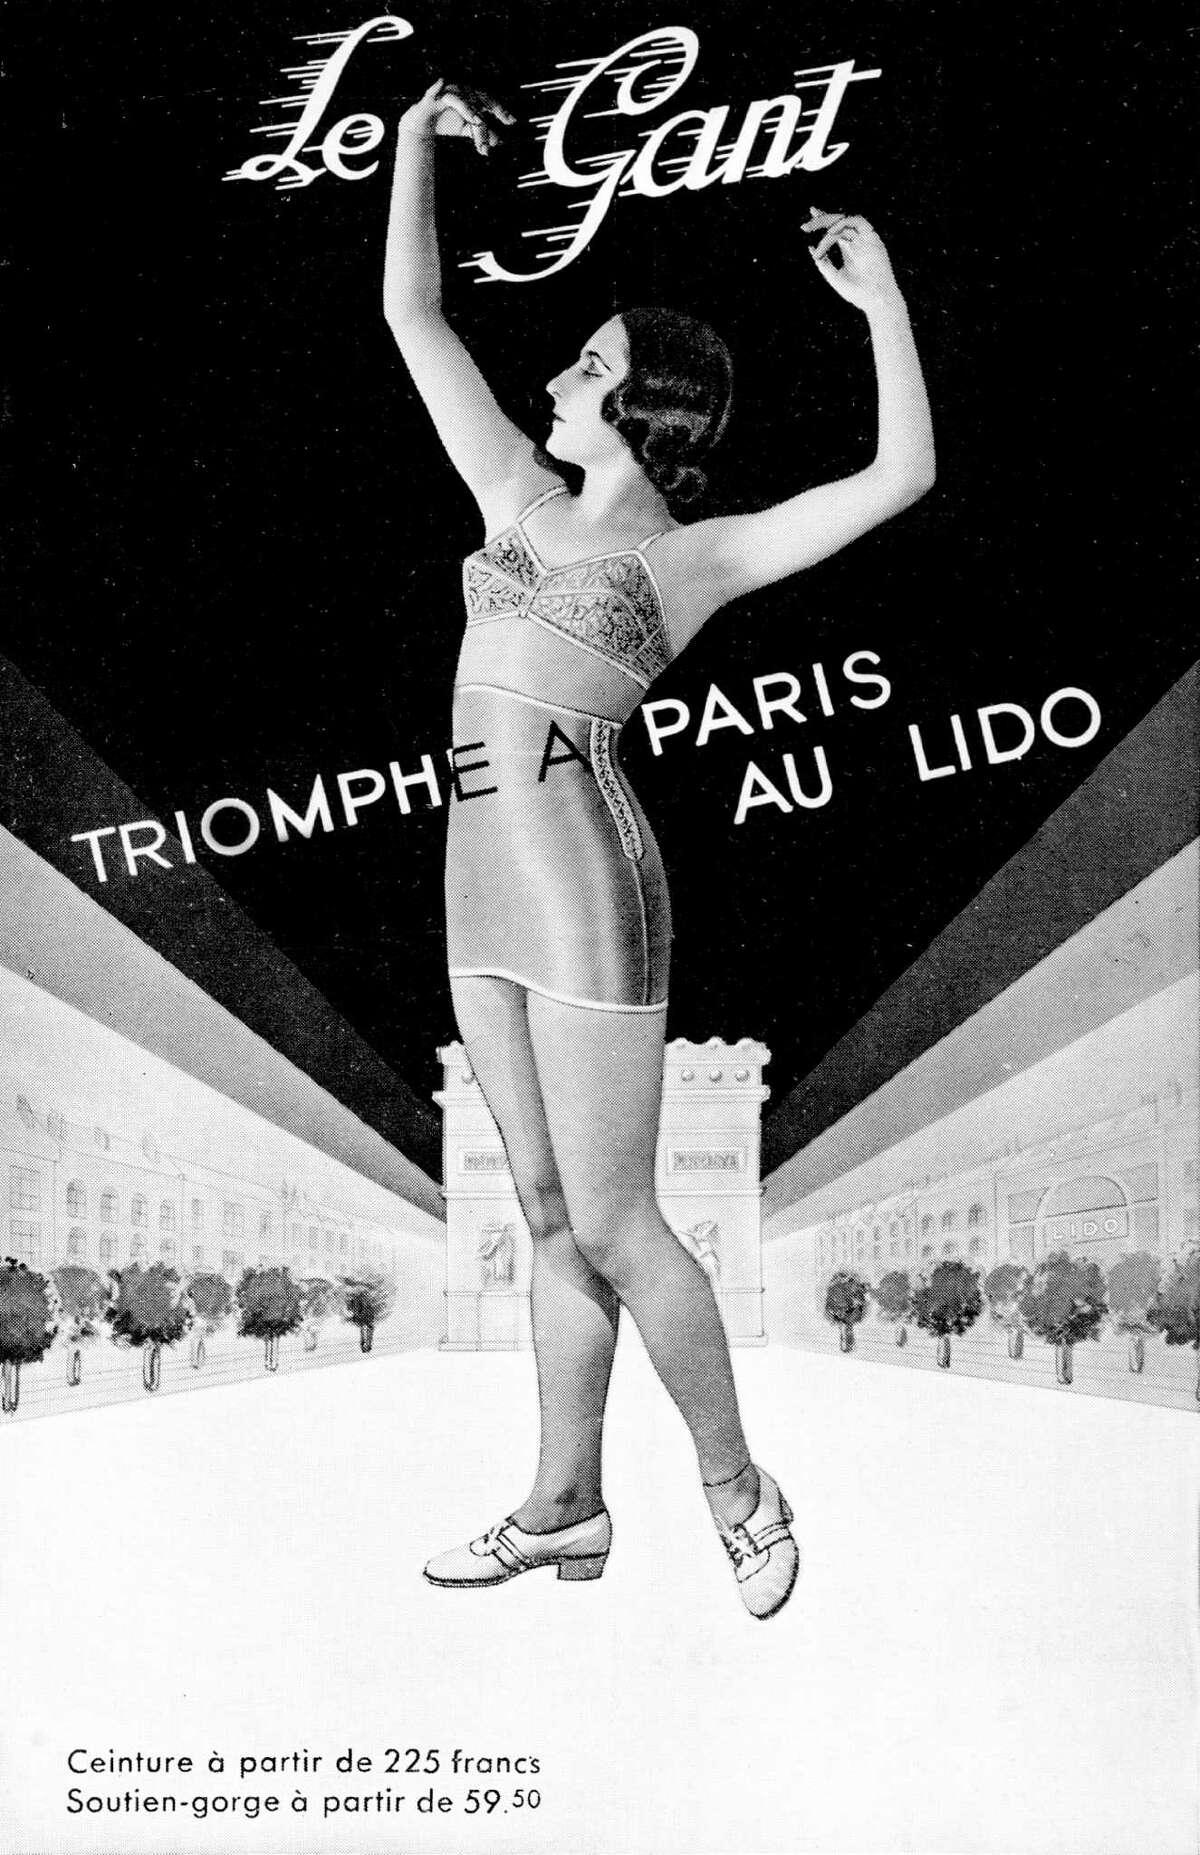 1920 Lingerie, bra and girdle